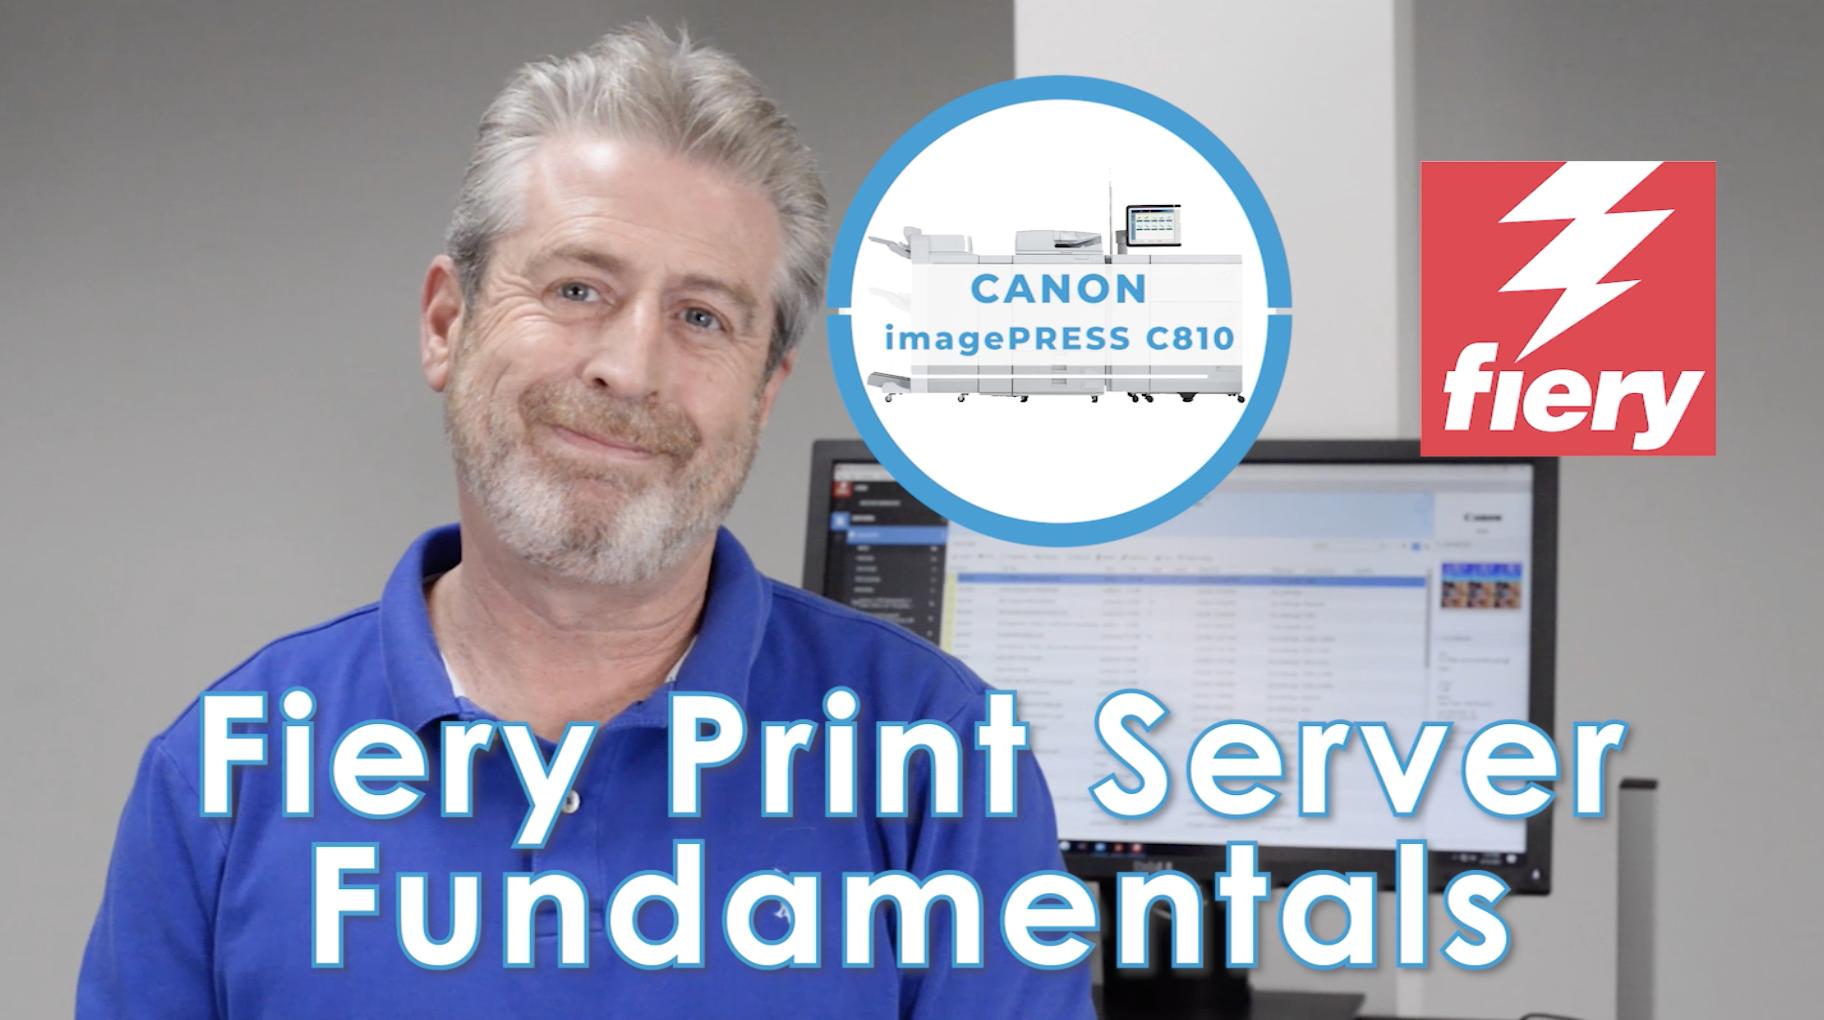 Fiery Print Server Fundamentals